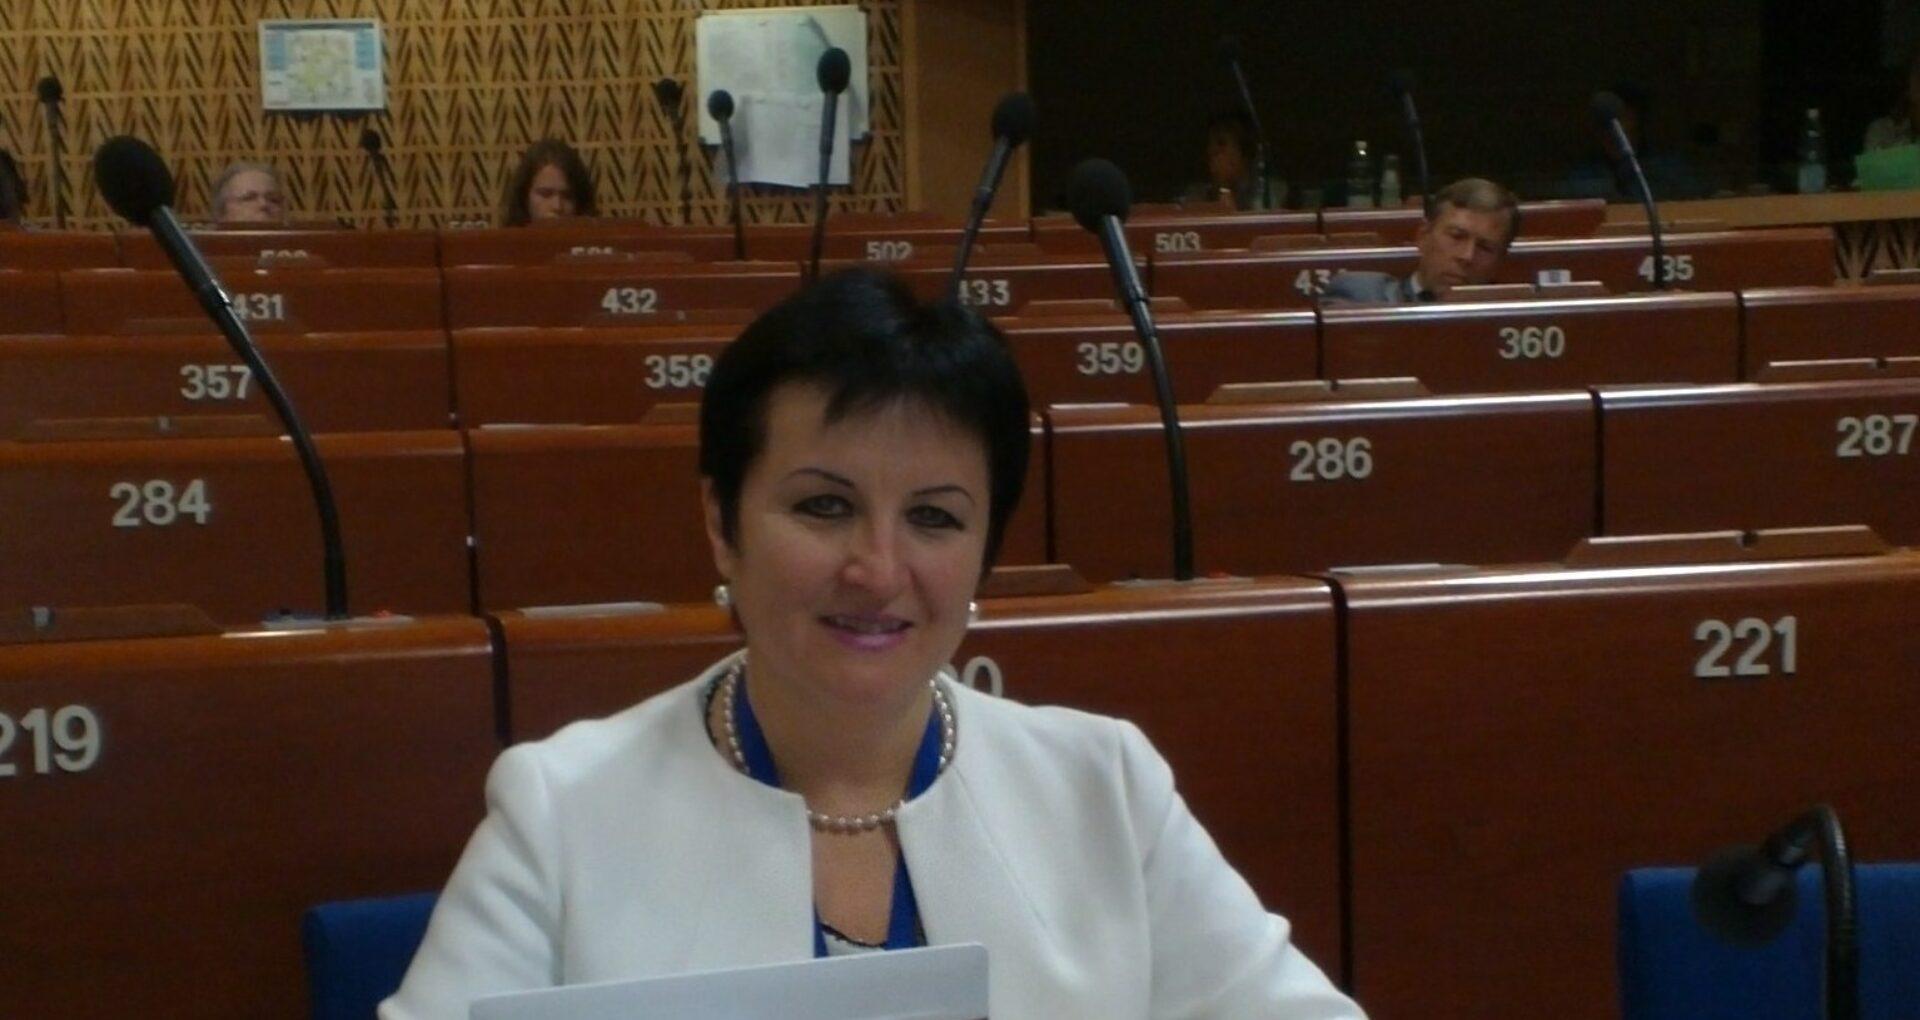 Azi la Chişinău este lansat un nou partid politic